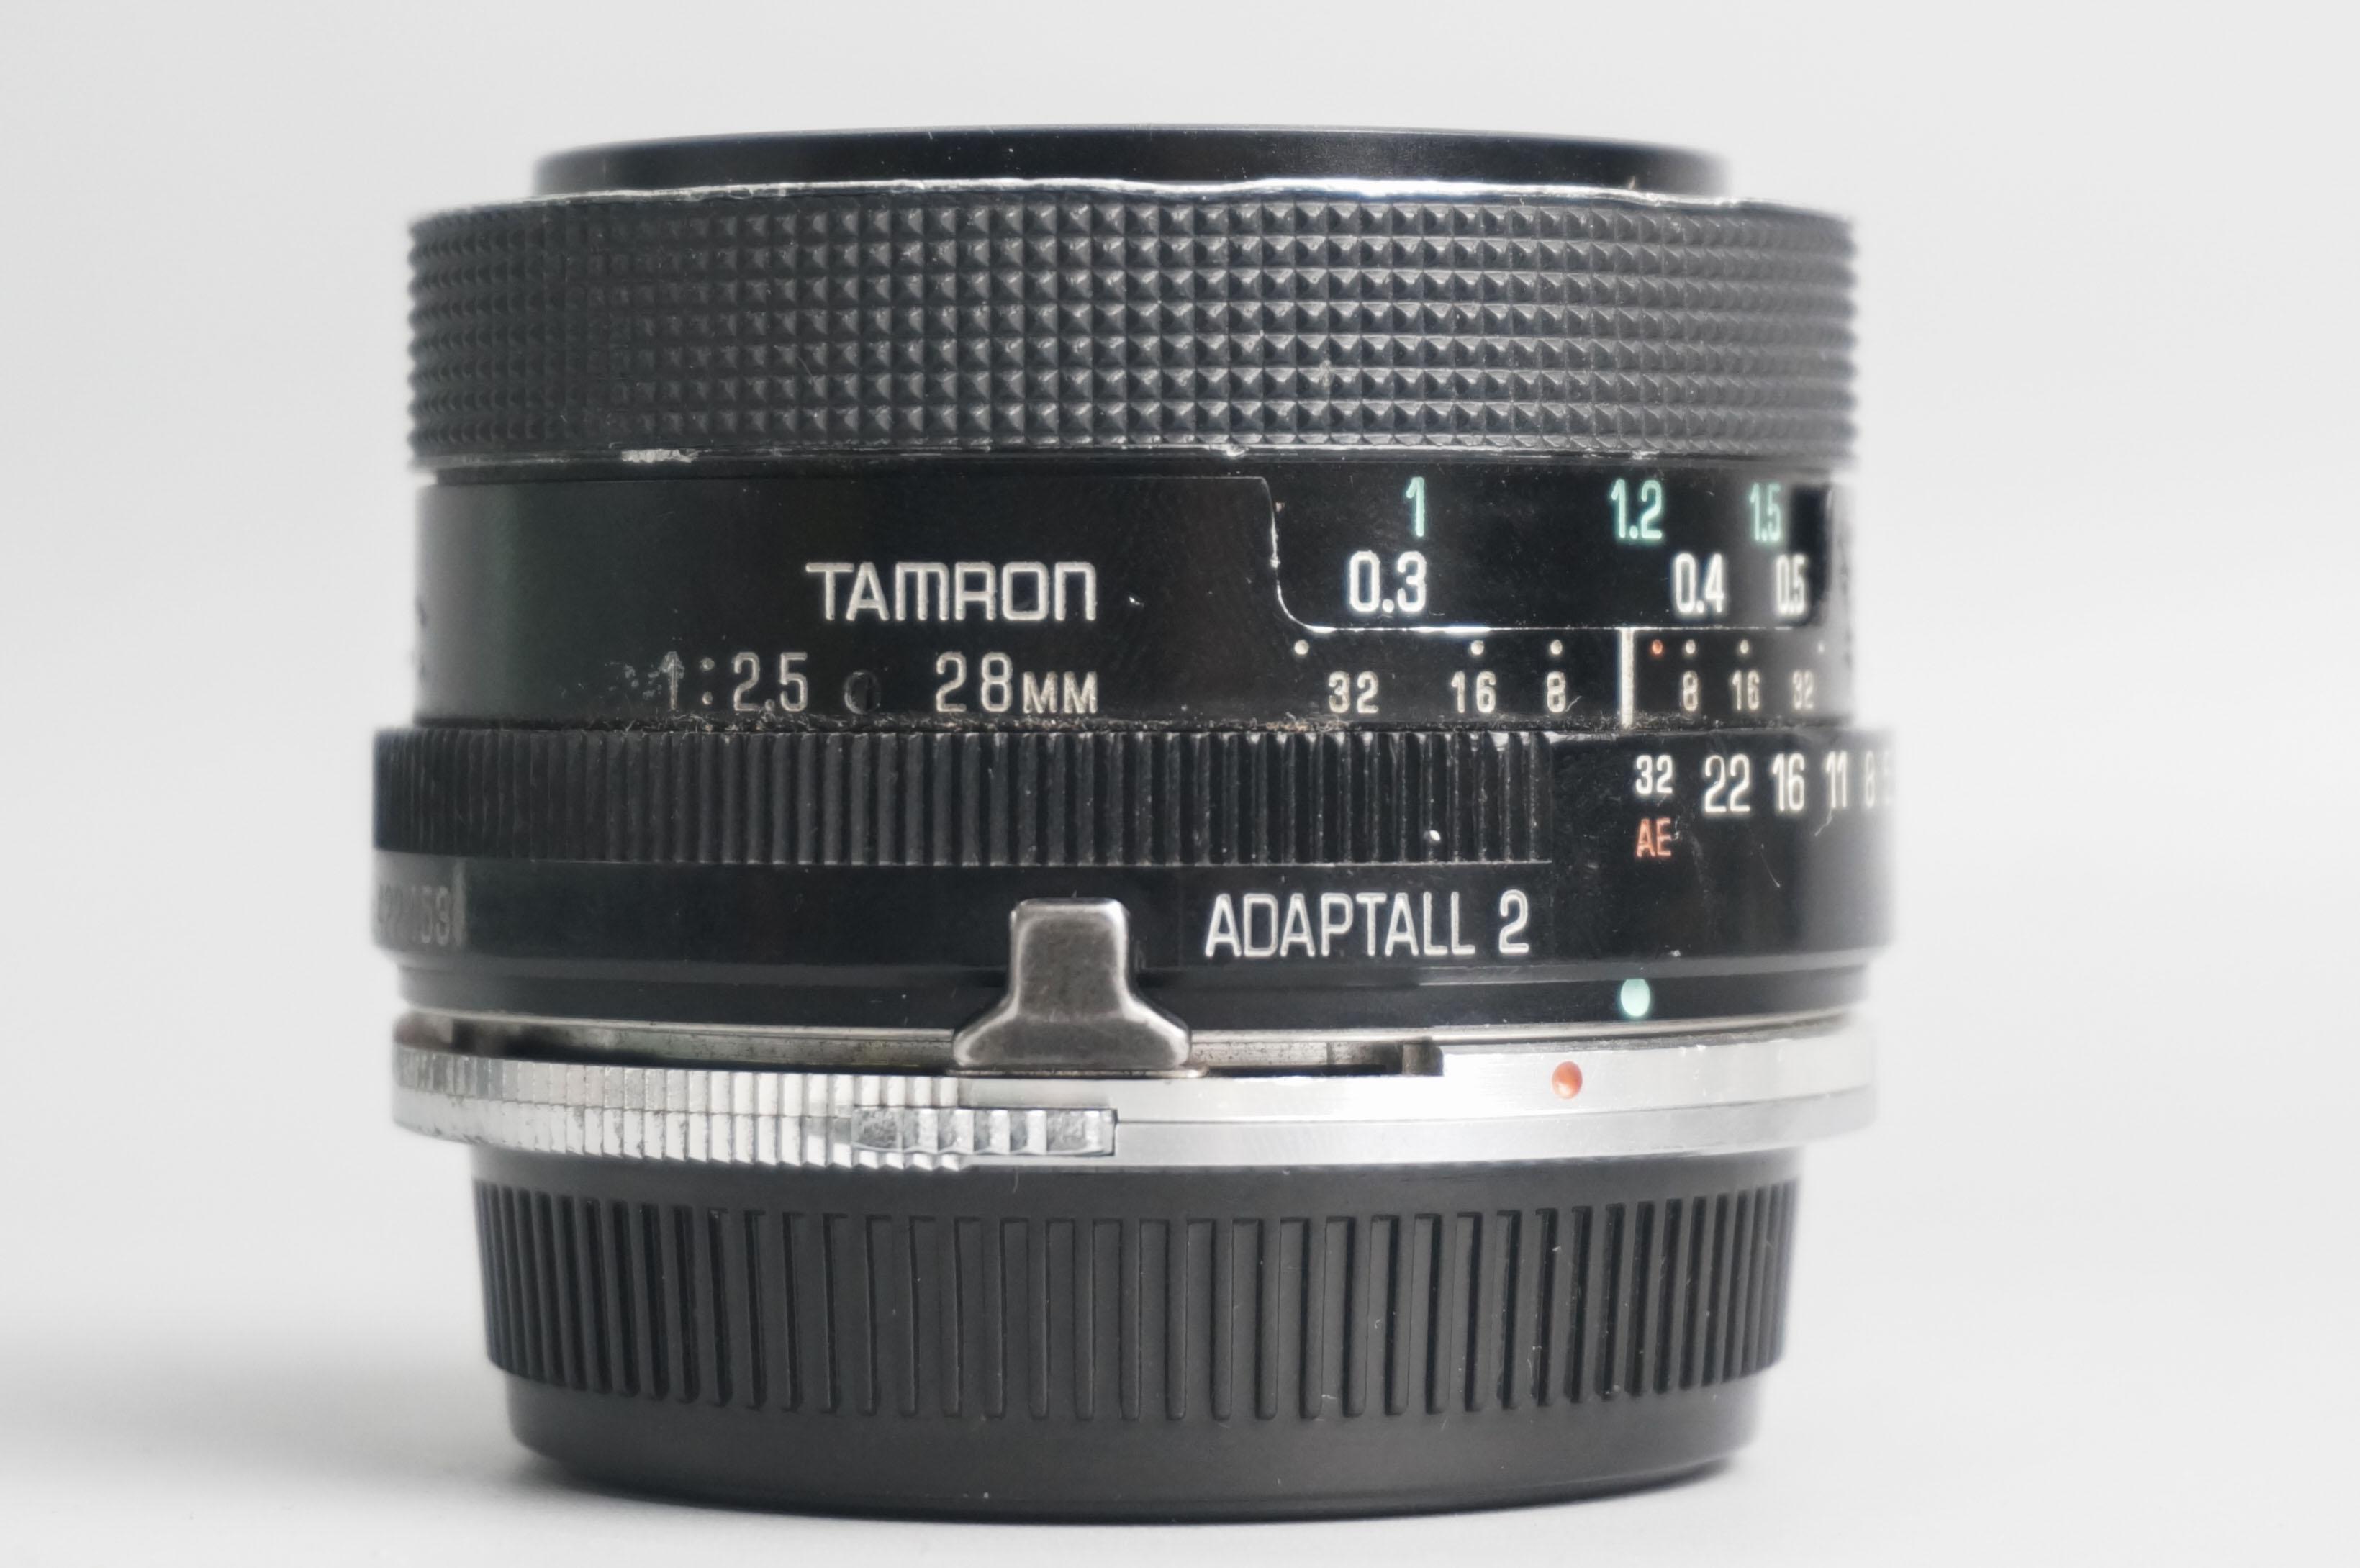 tamron-28mm-f2-5-adaptall-2-28-2-5-16428